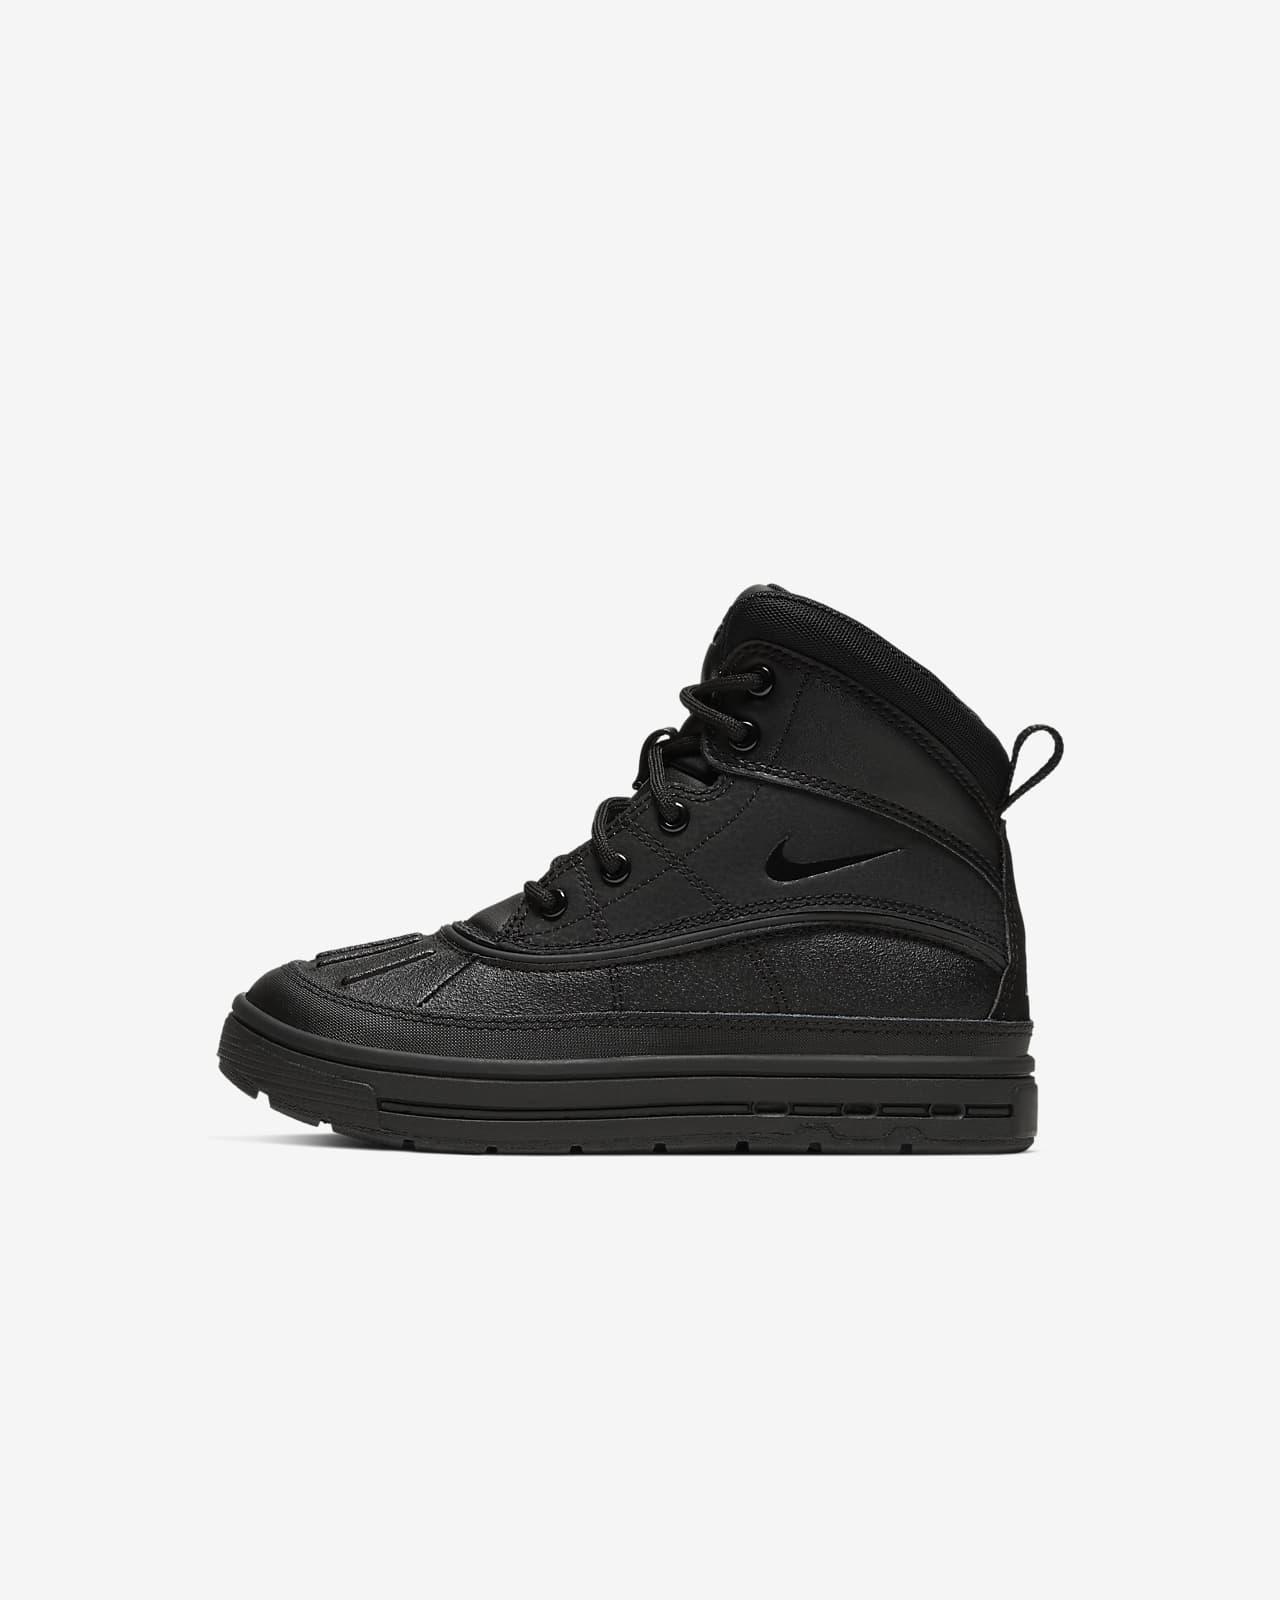 Nike Woodside 2 High ACG Little Kids' Boot